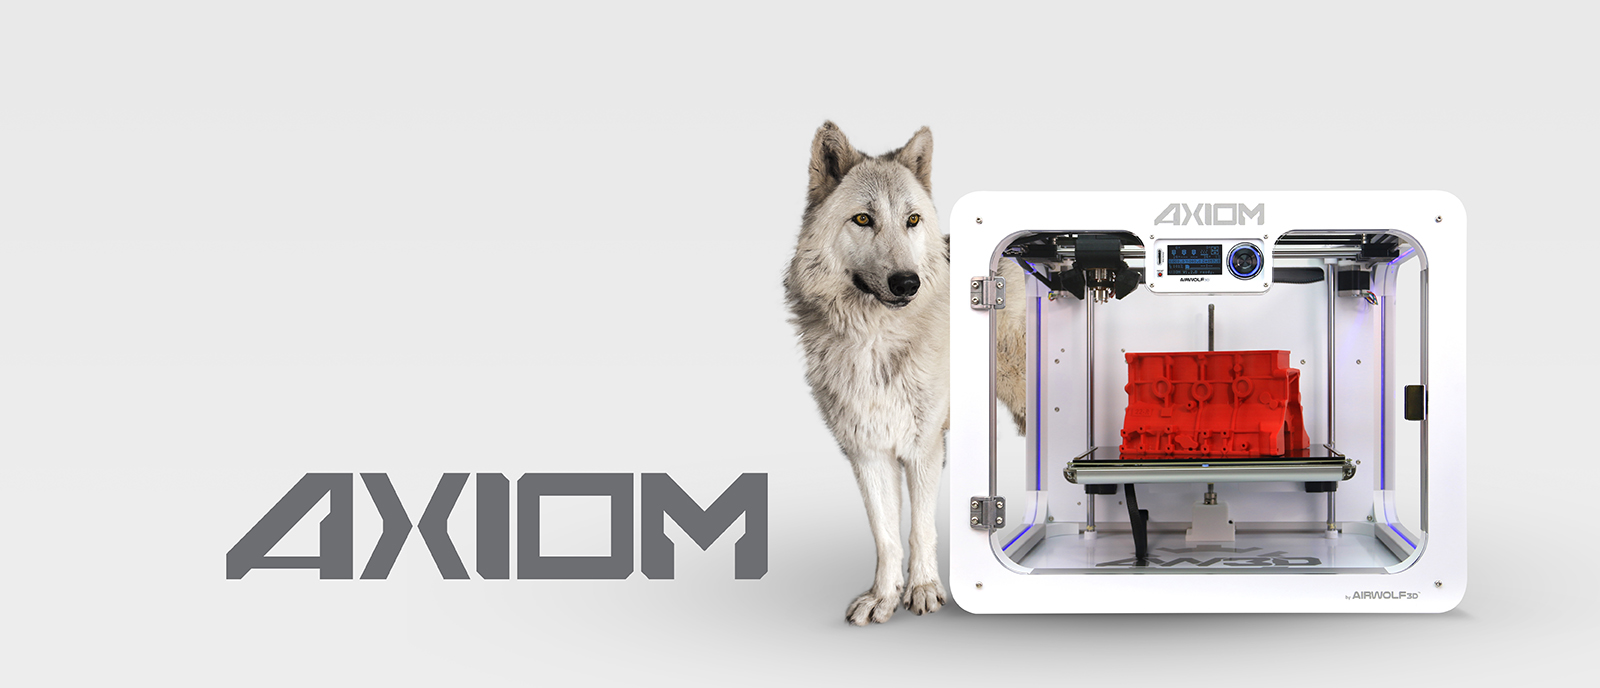 Axiom 3D printer Slider image